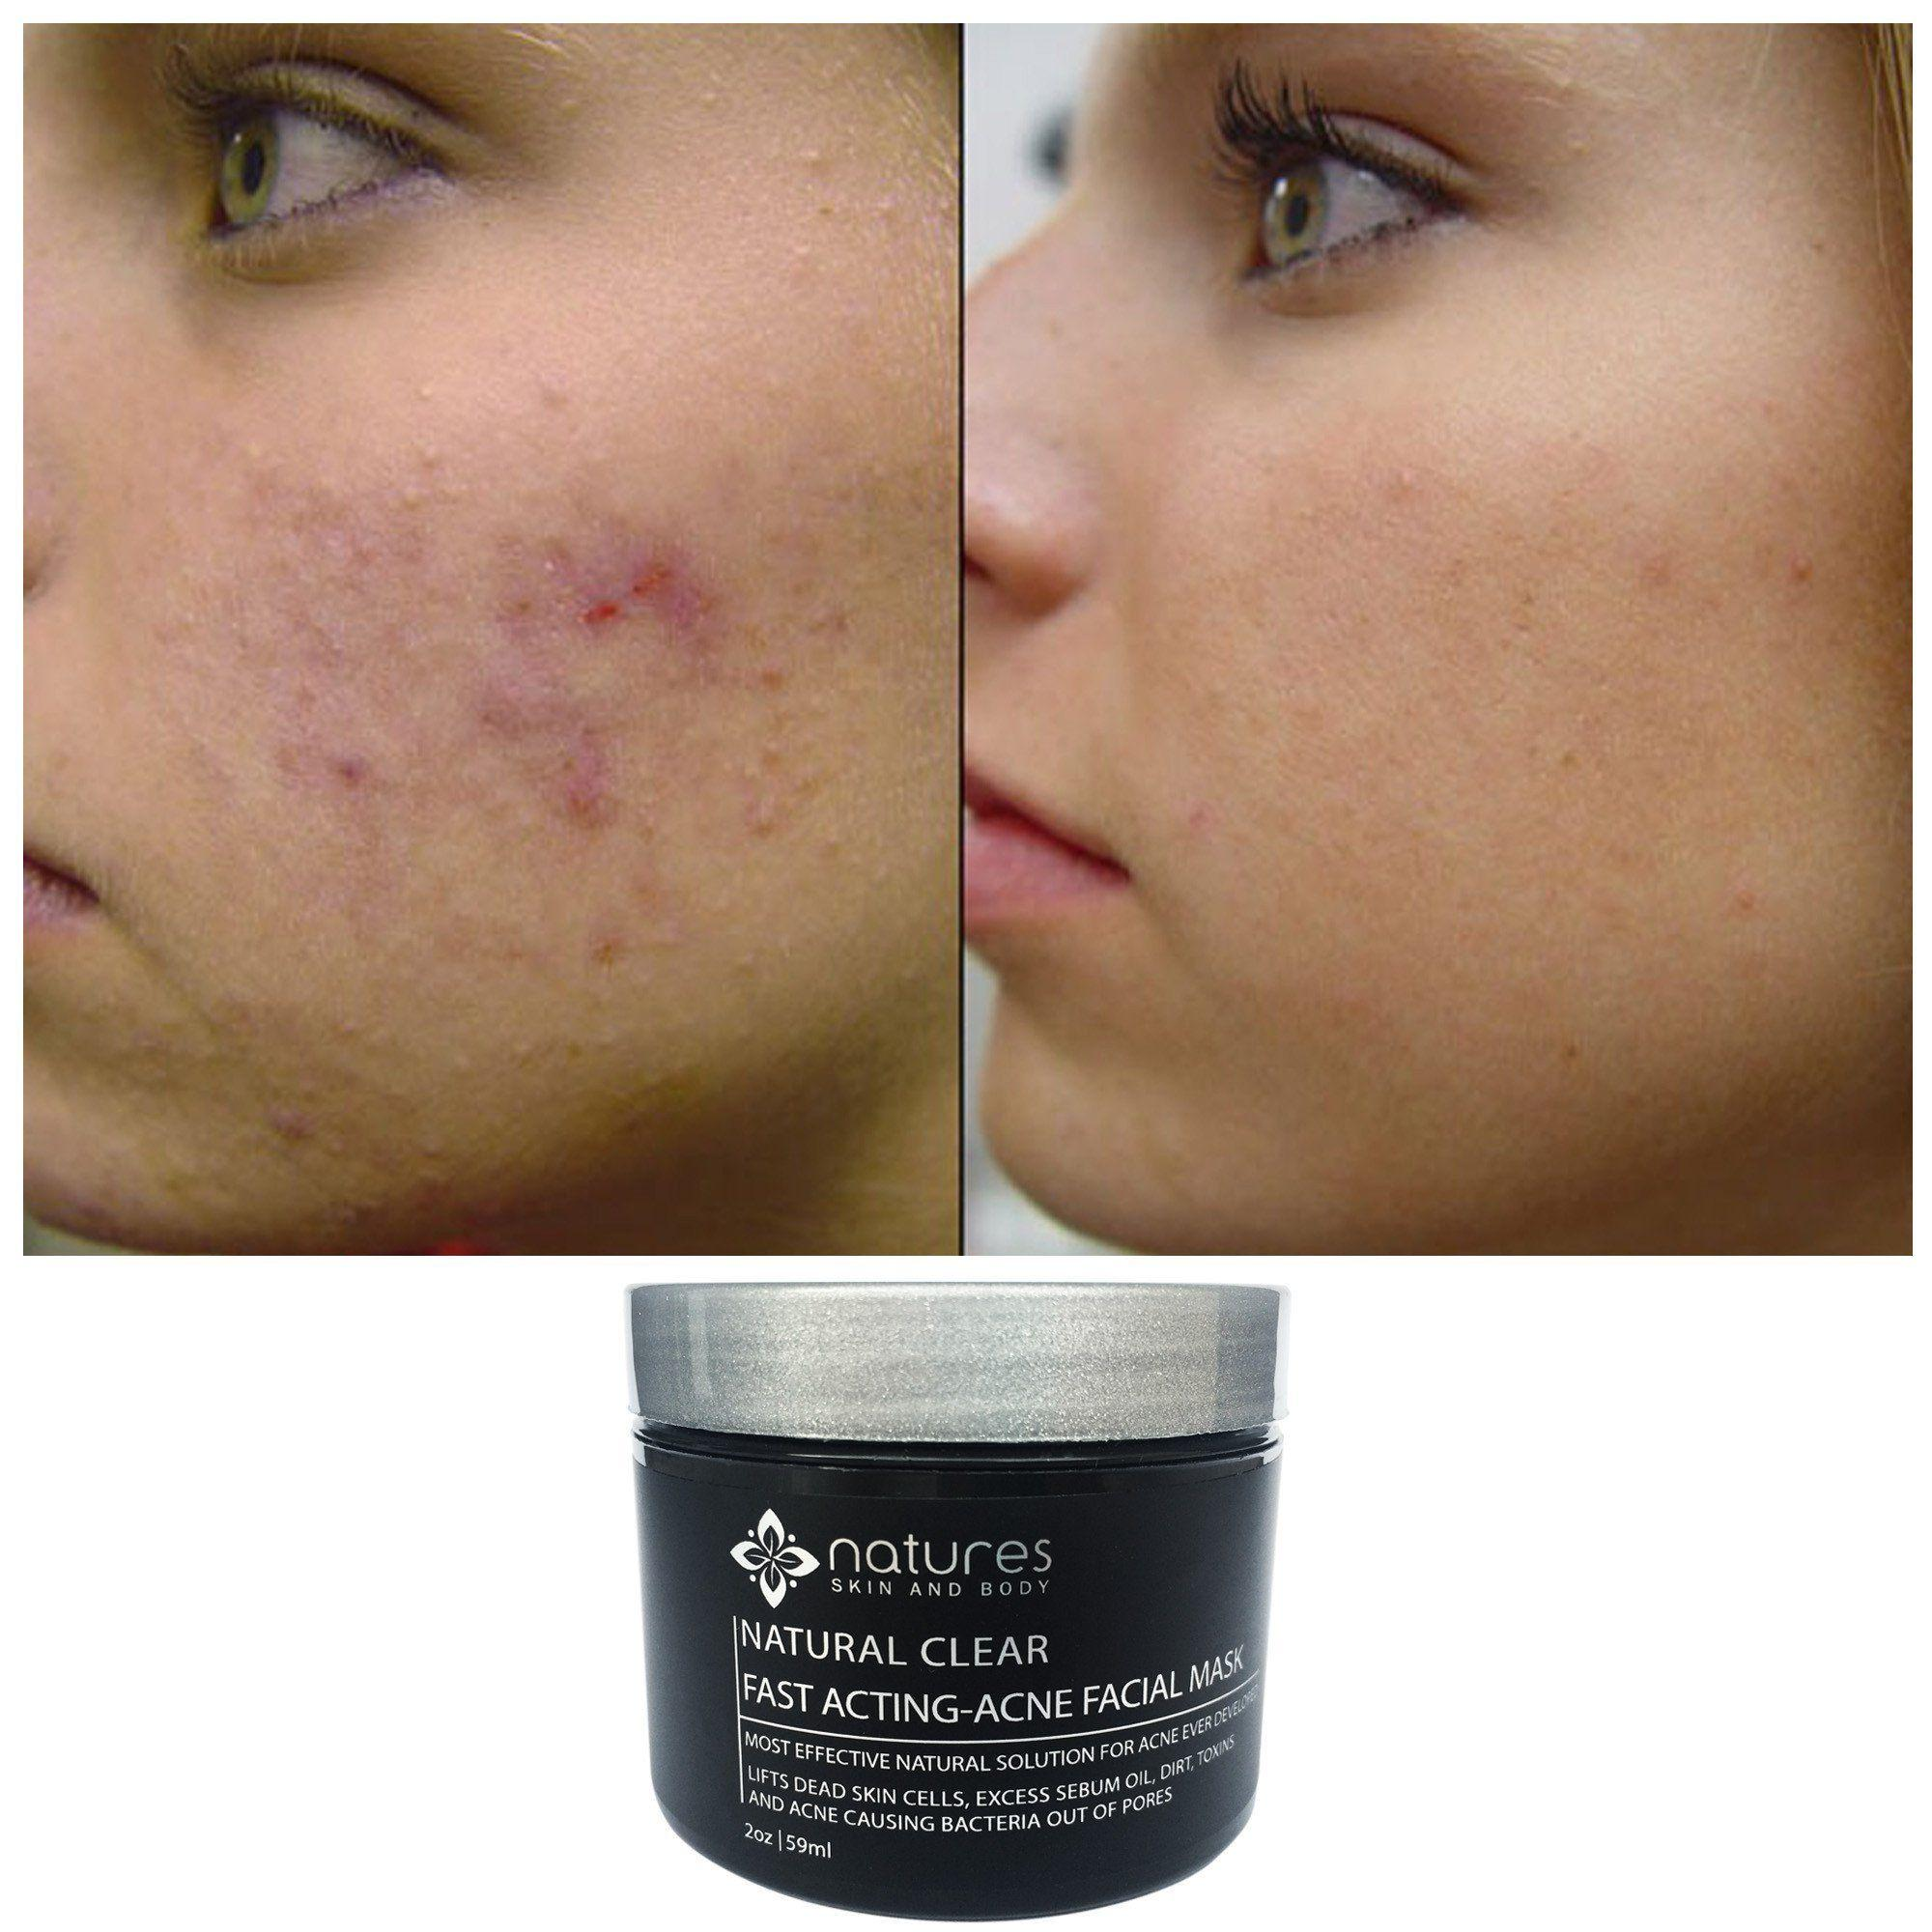 Mad D. reccomend Clear facial acne